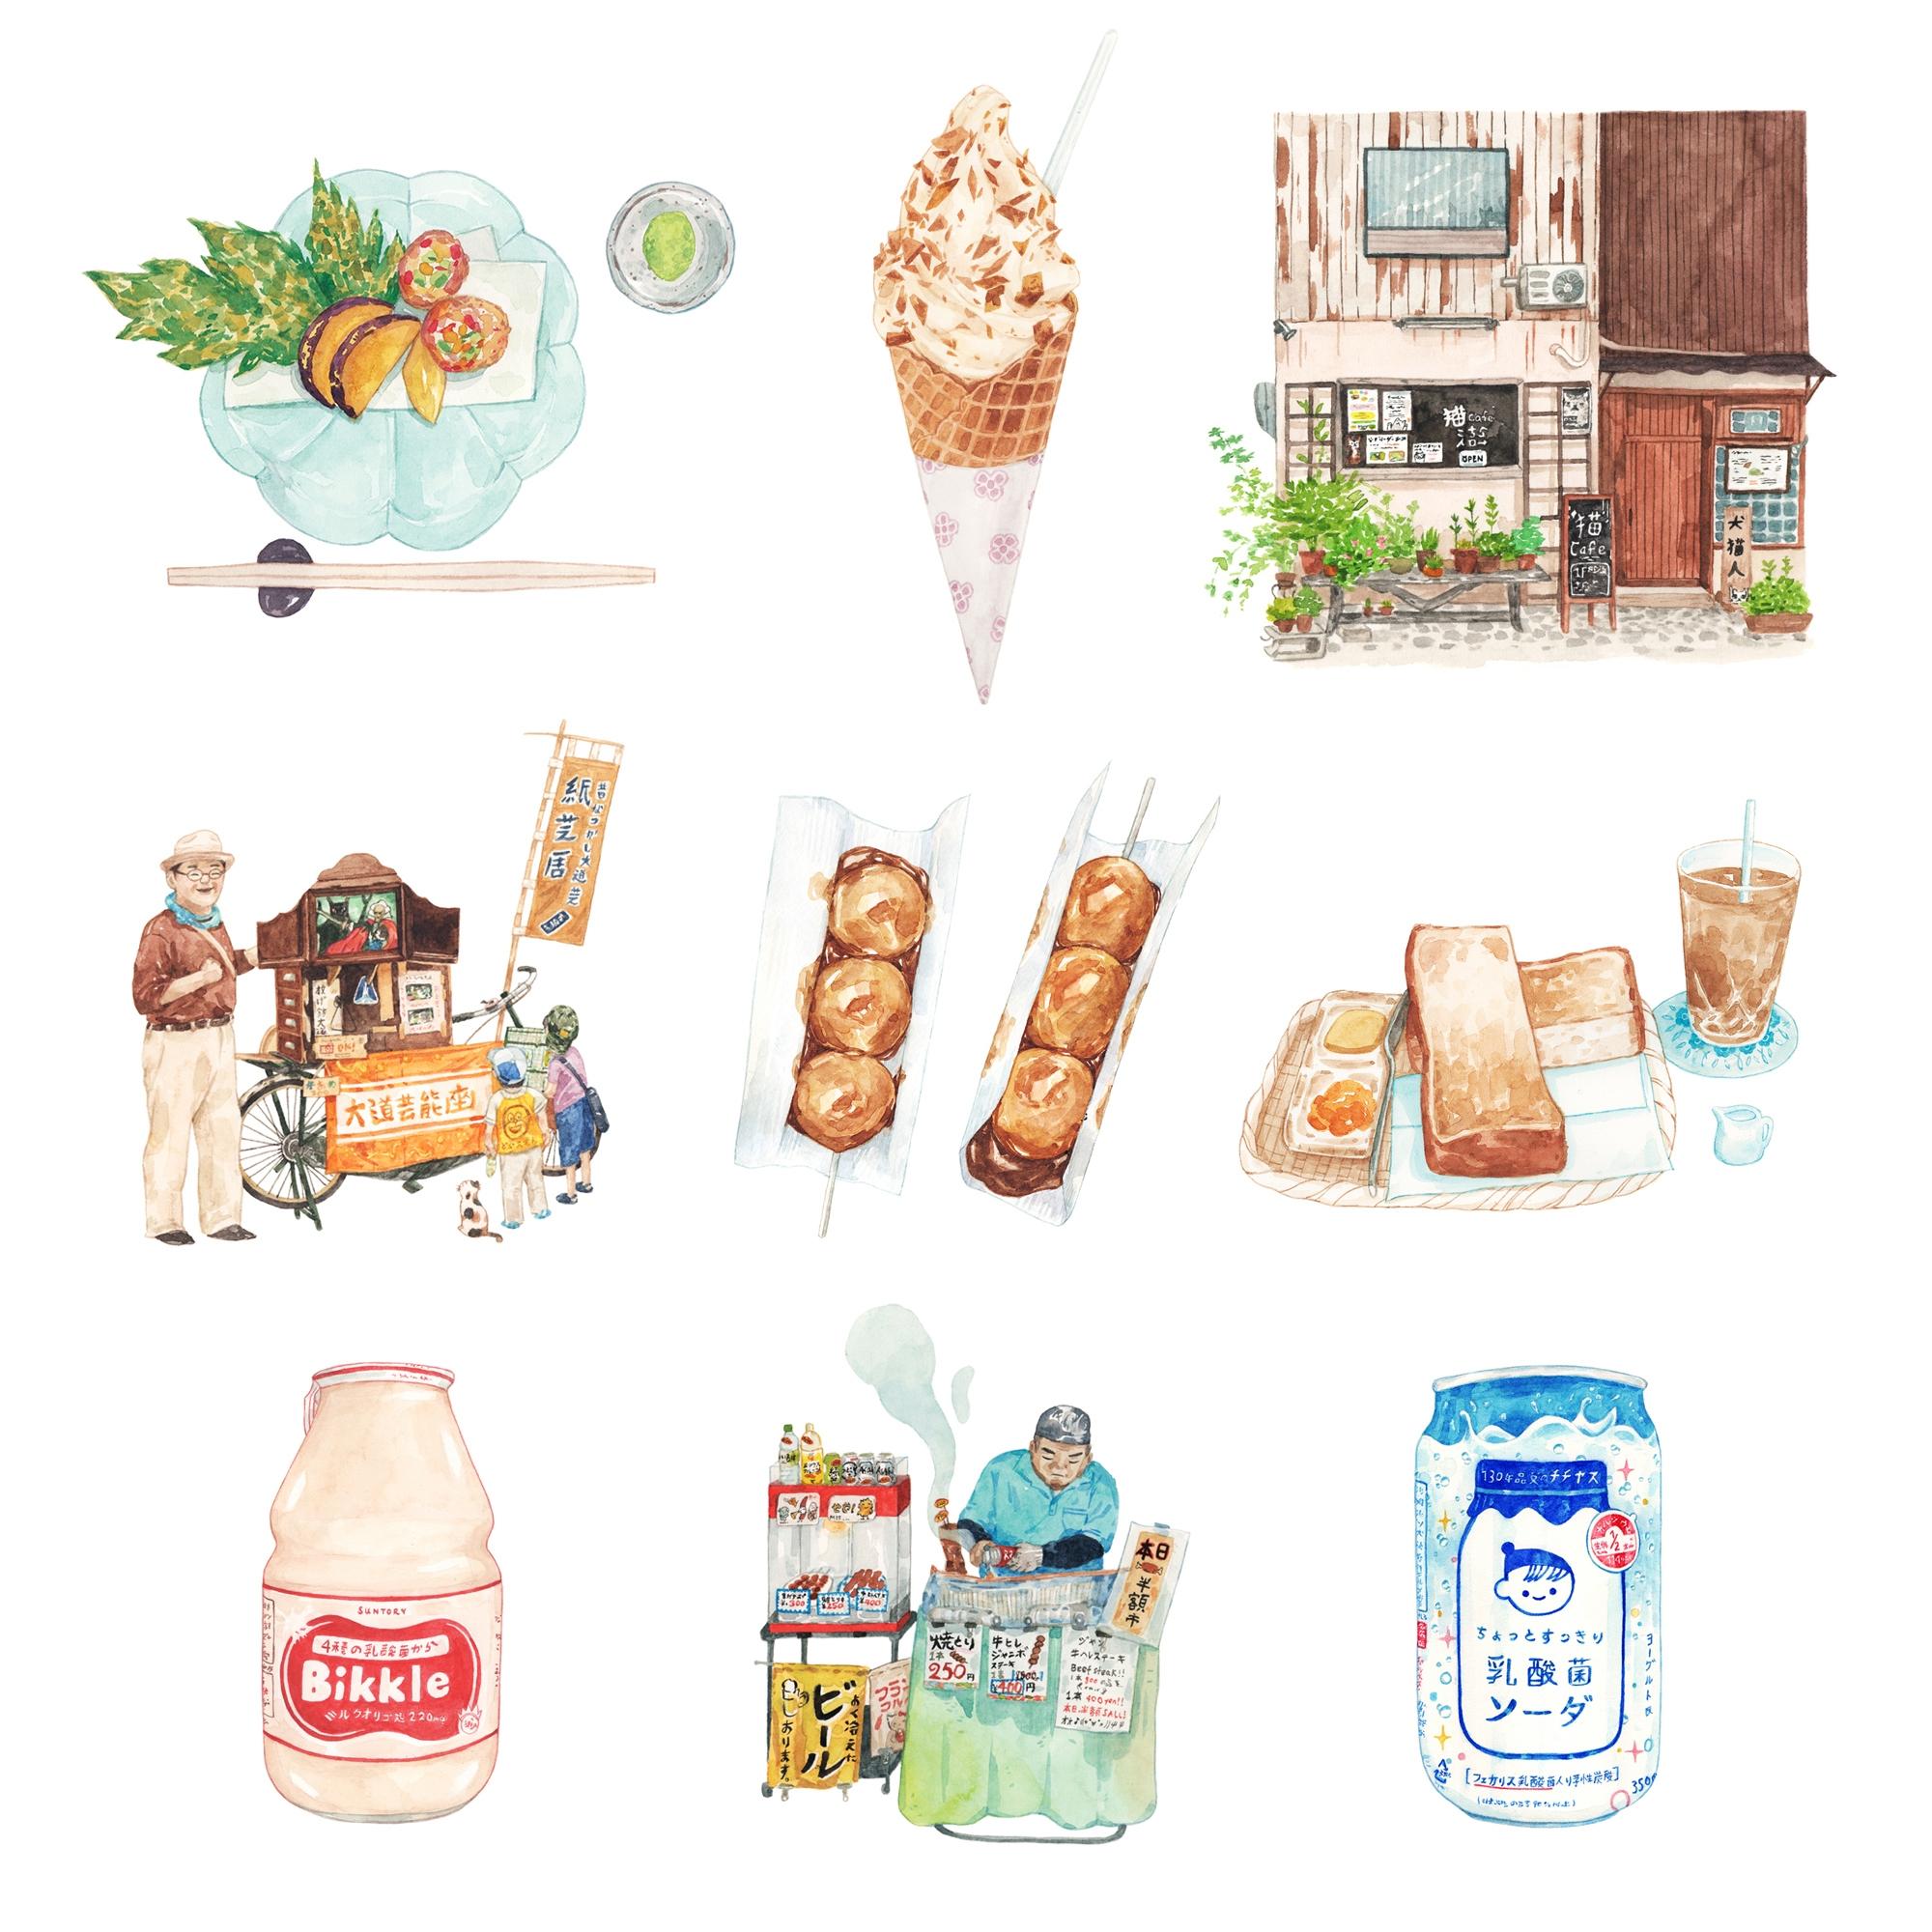 Store-advertisement-instagram.jpg